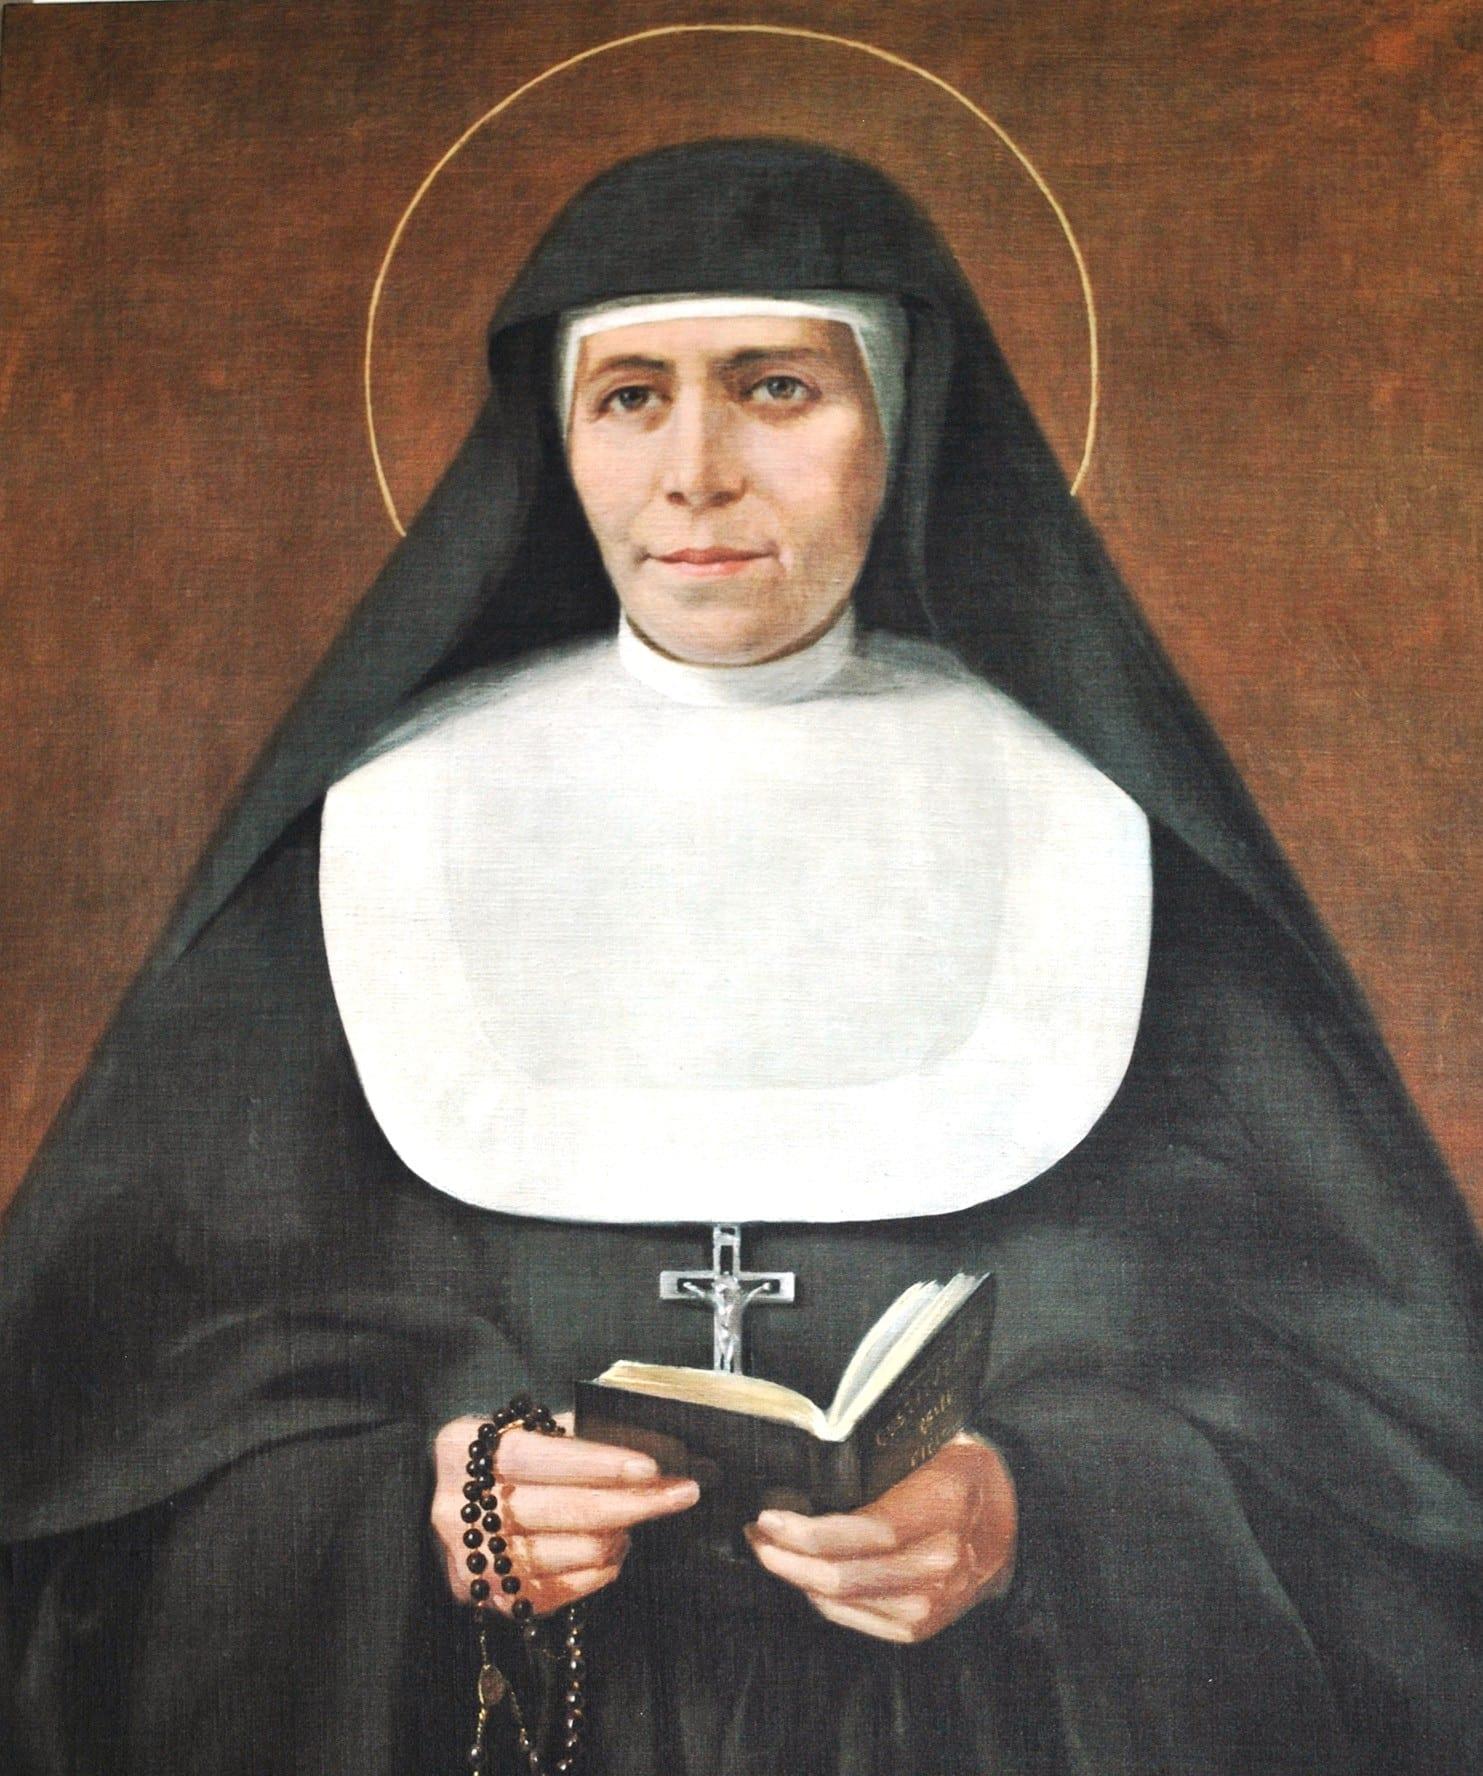 Mary Mazzarello